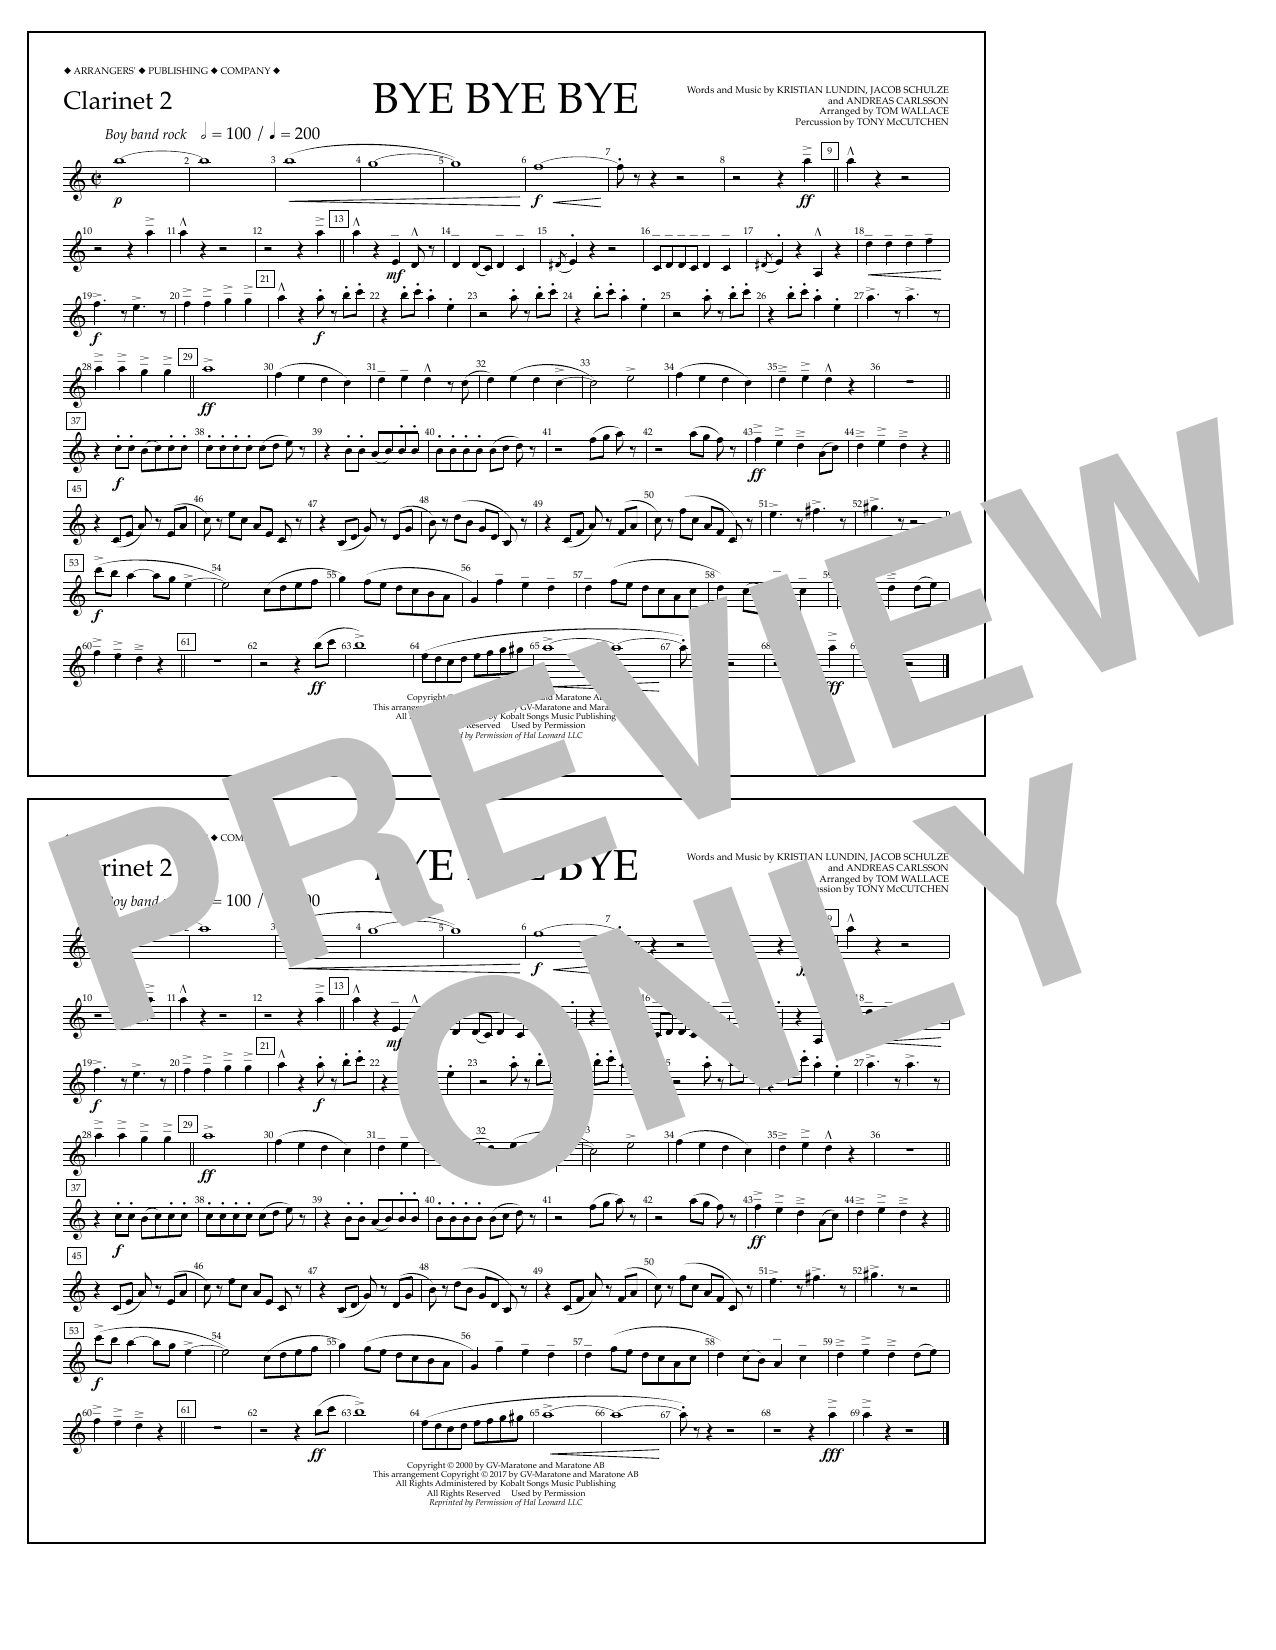 Bye Bye Bye - Clarinet 2 Sheet Music